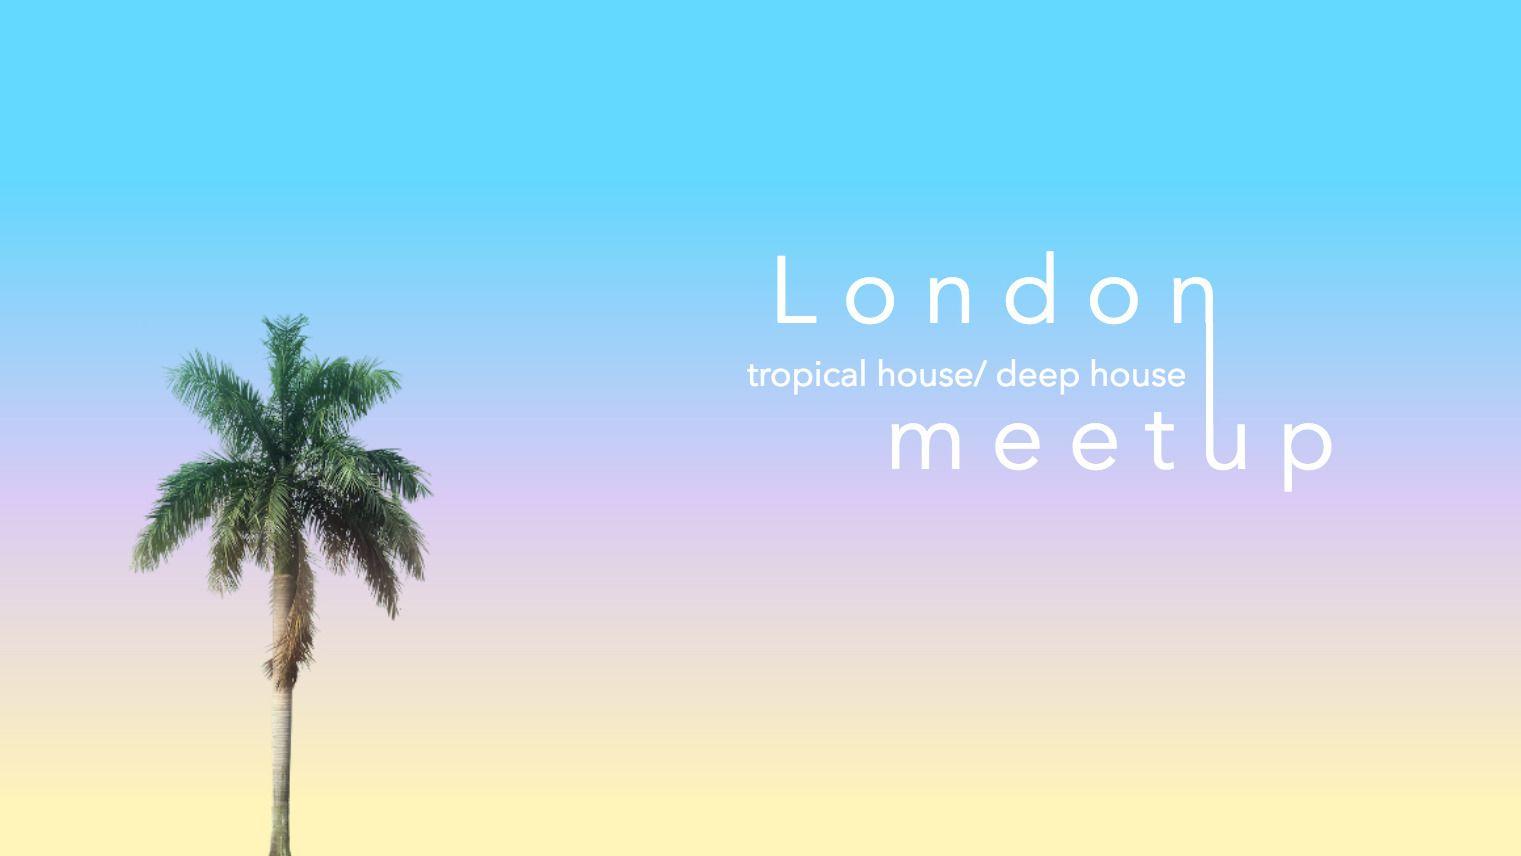 London Tropical House/ Deep House Meetup